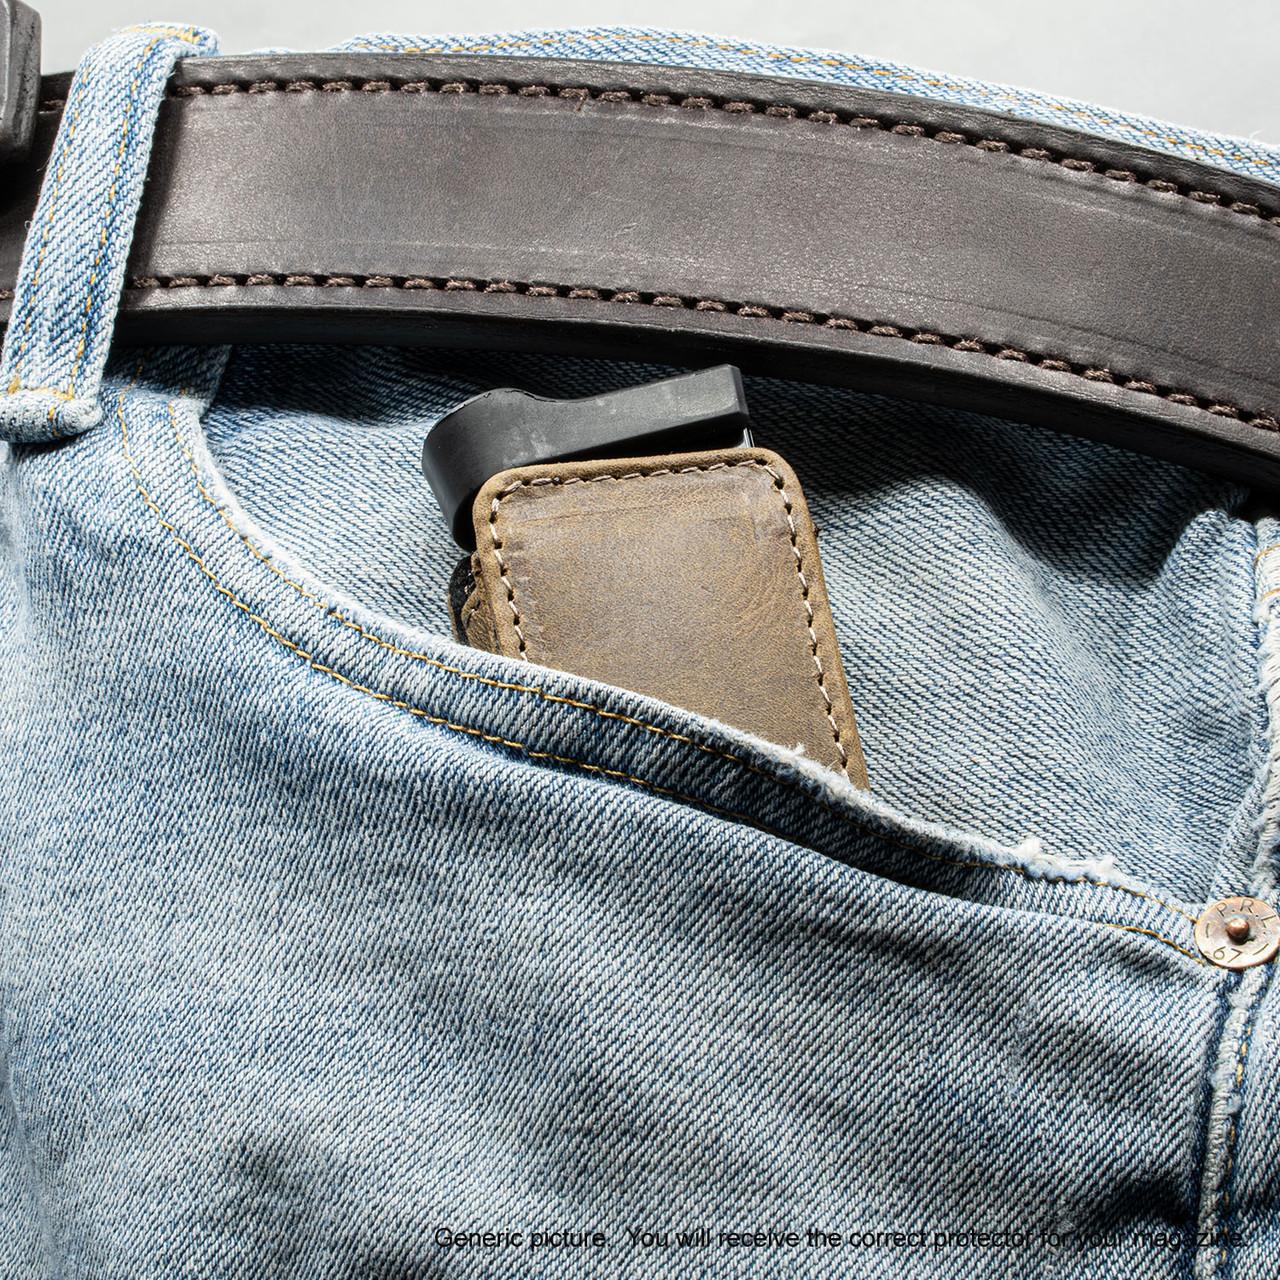 M&P Shield .40 Brown Freedom Magazine Pocket Protector